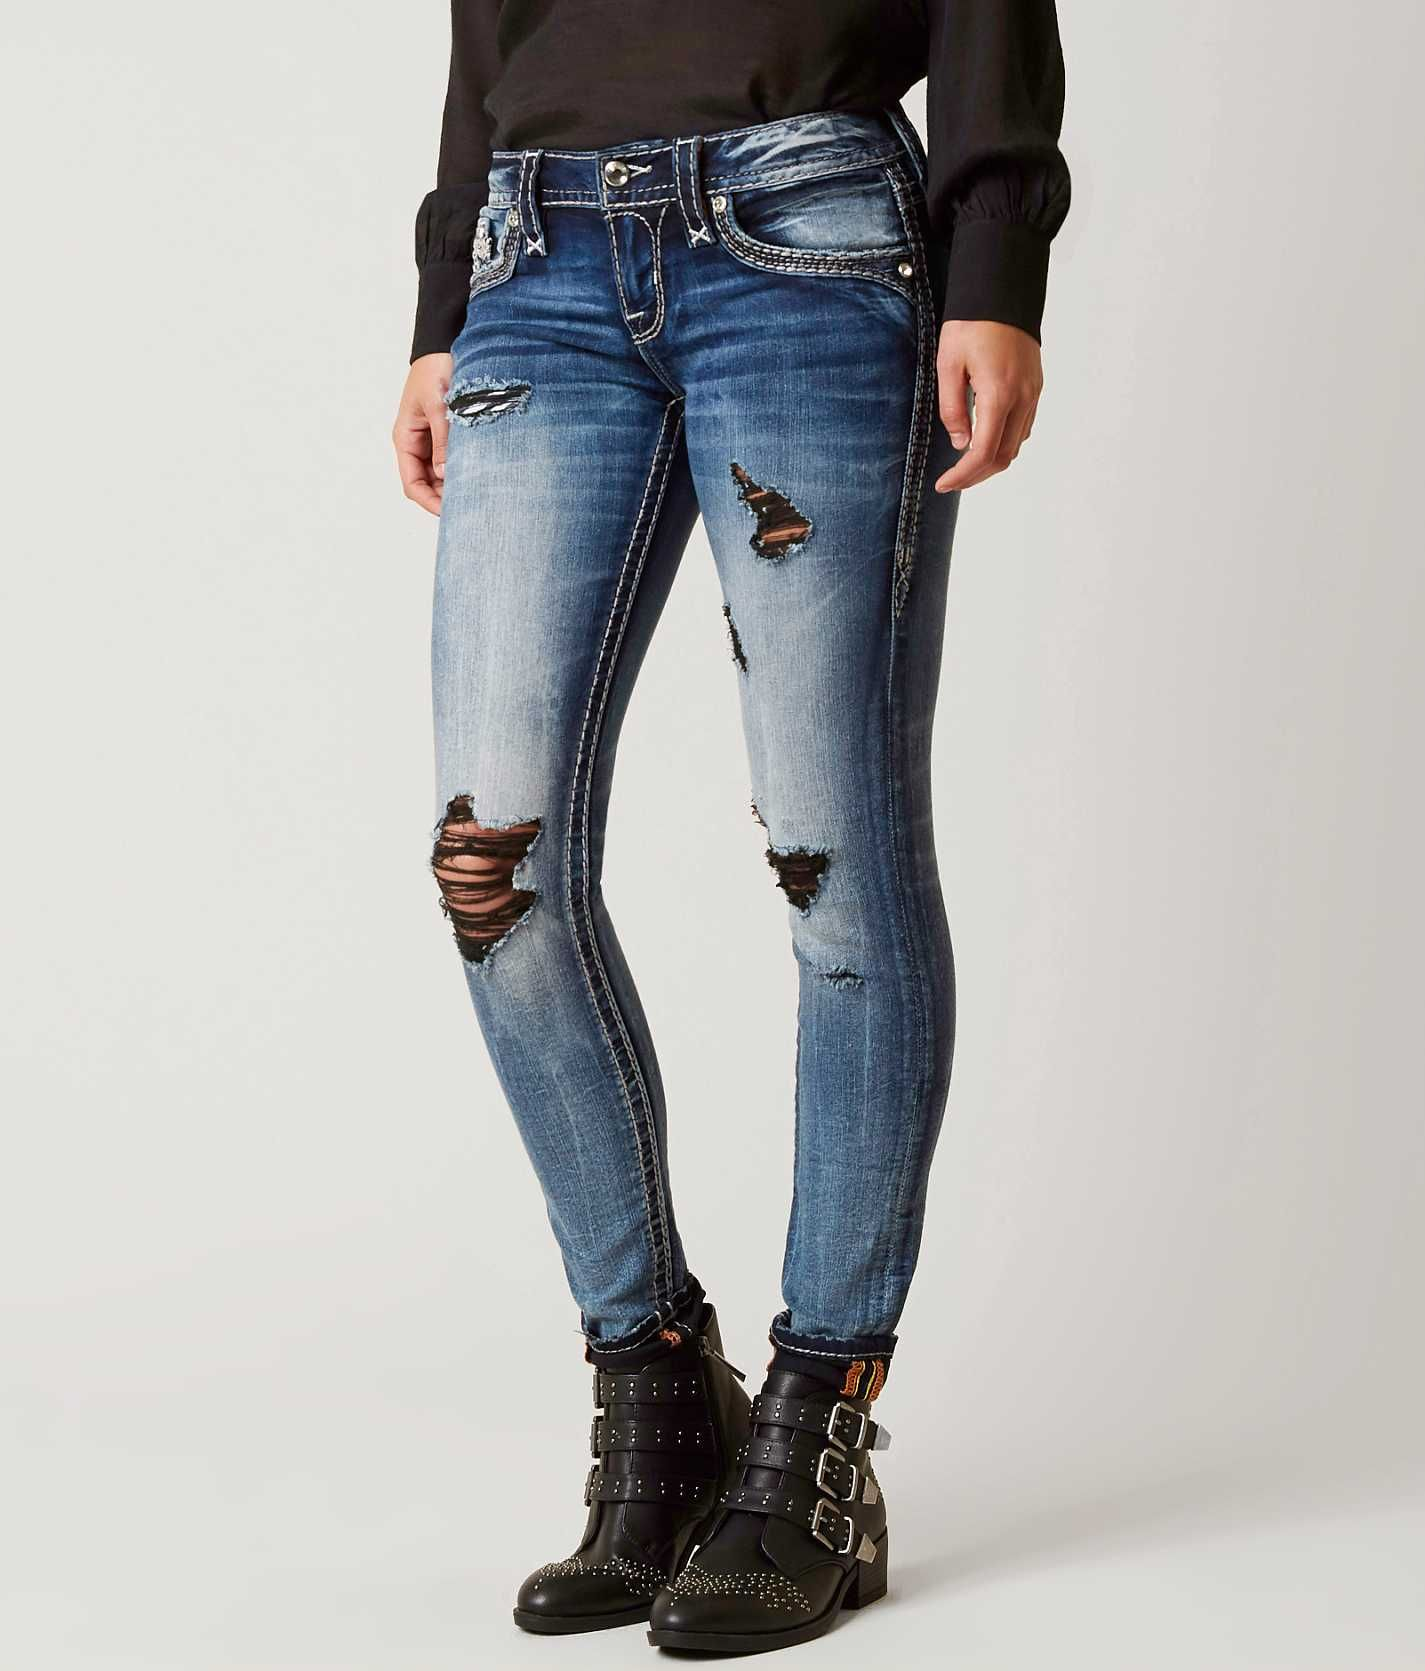 1dbe08a4acf Rock Revival Yui Skinny Stretch Jean - Women s Jeans in Yui S213 ...